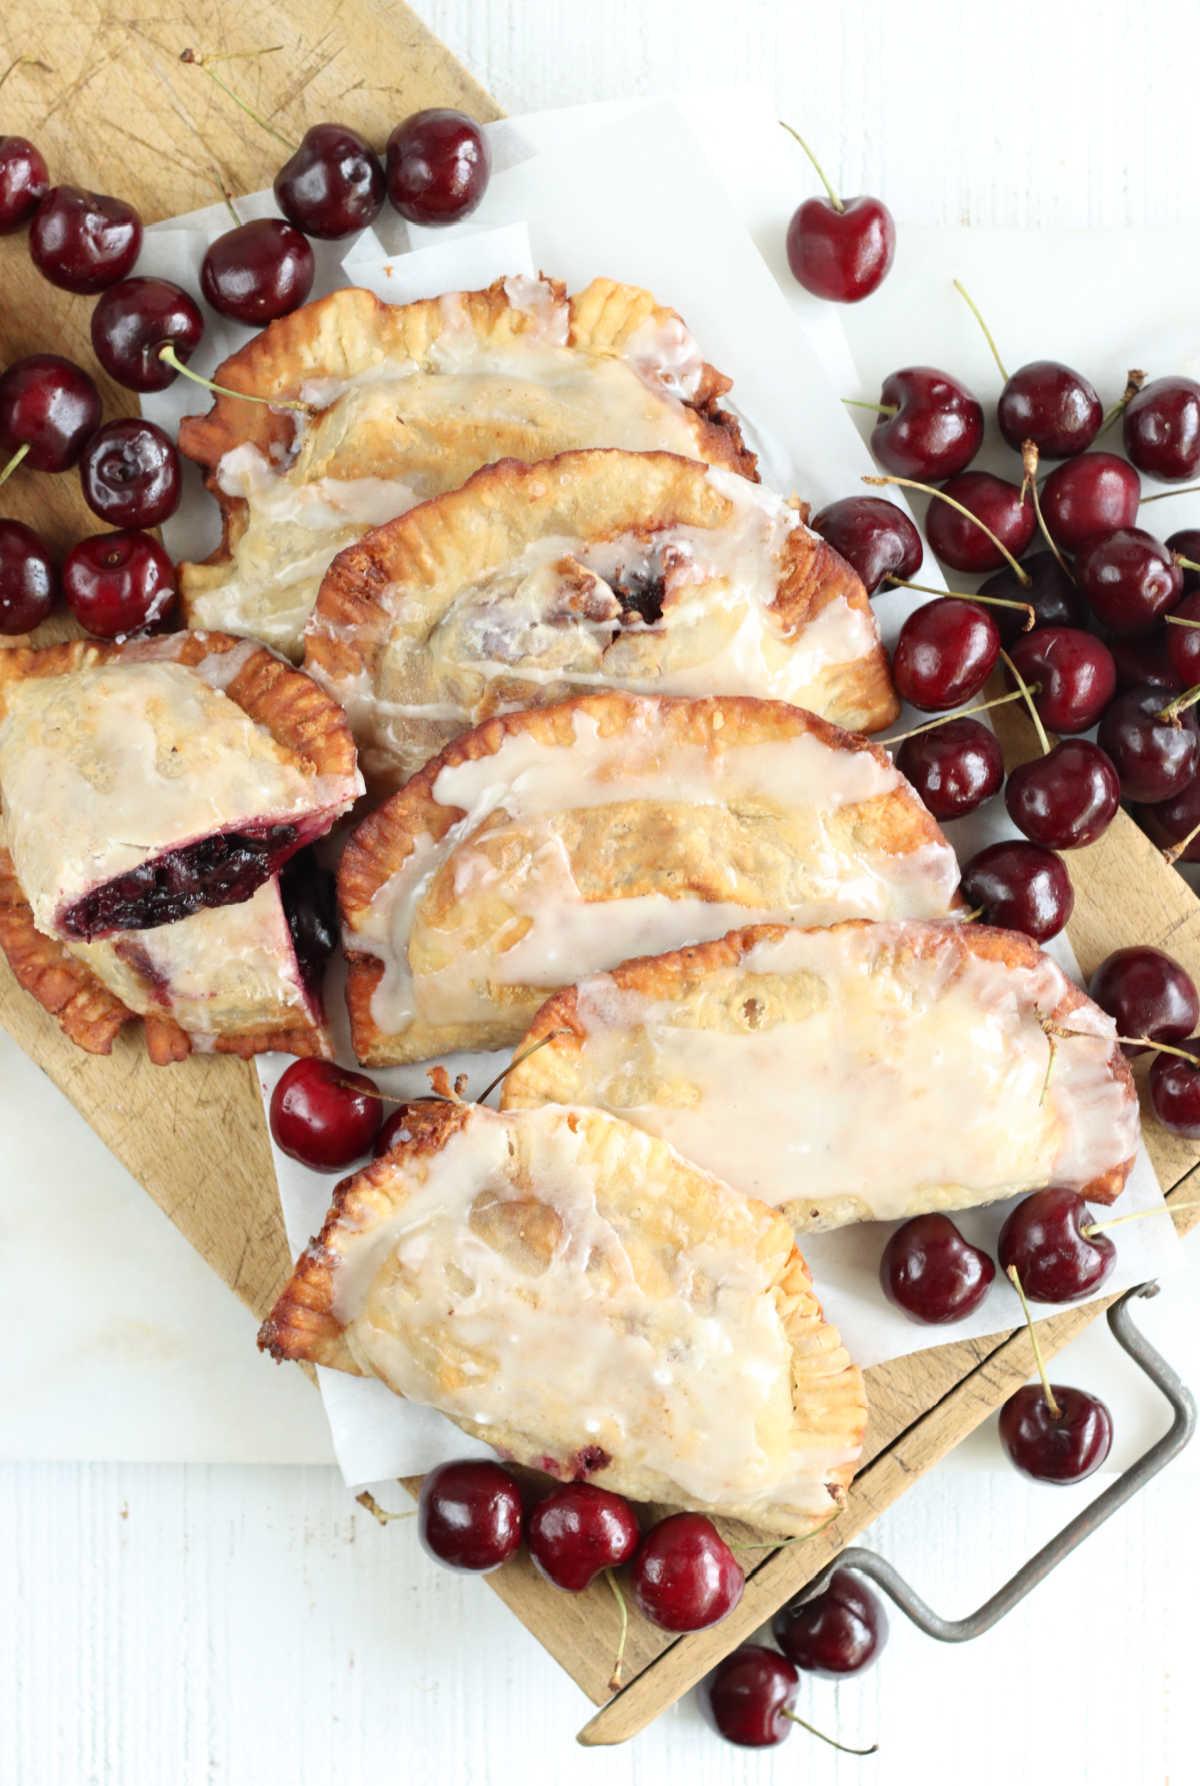 Cherry hand pies on wooden cutting board, fresh cherries around them.